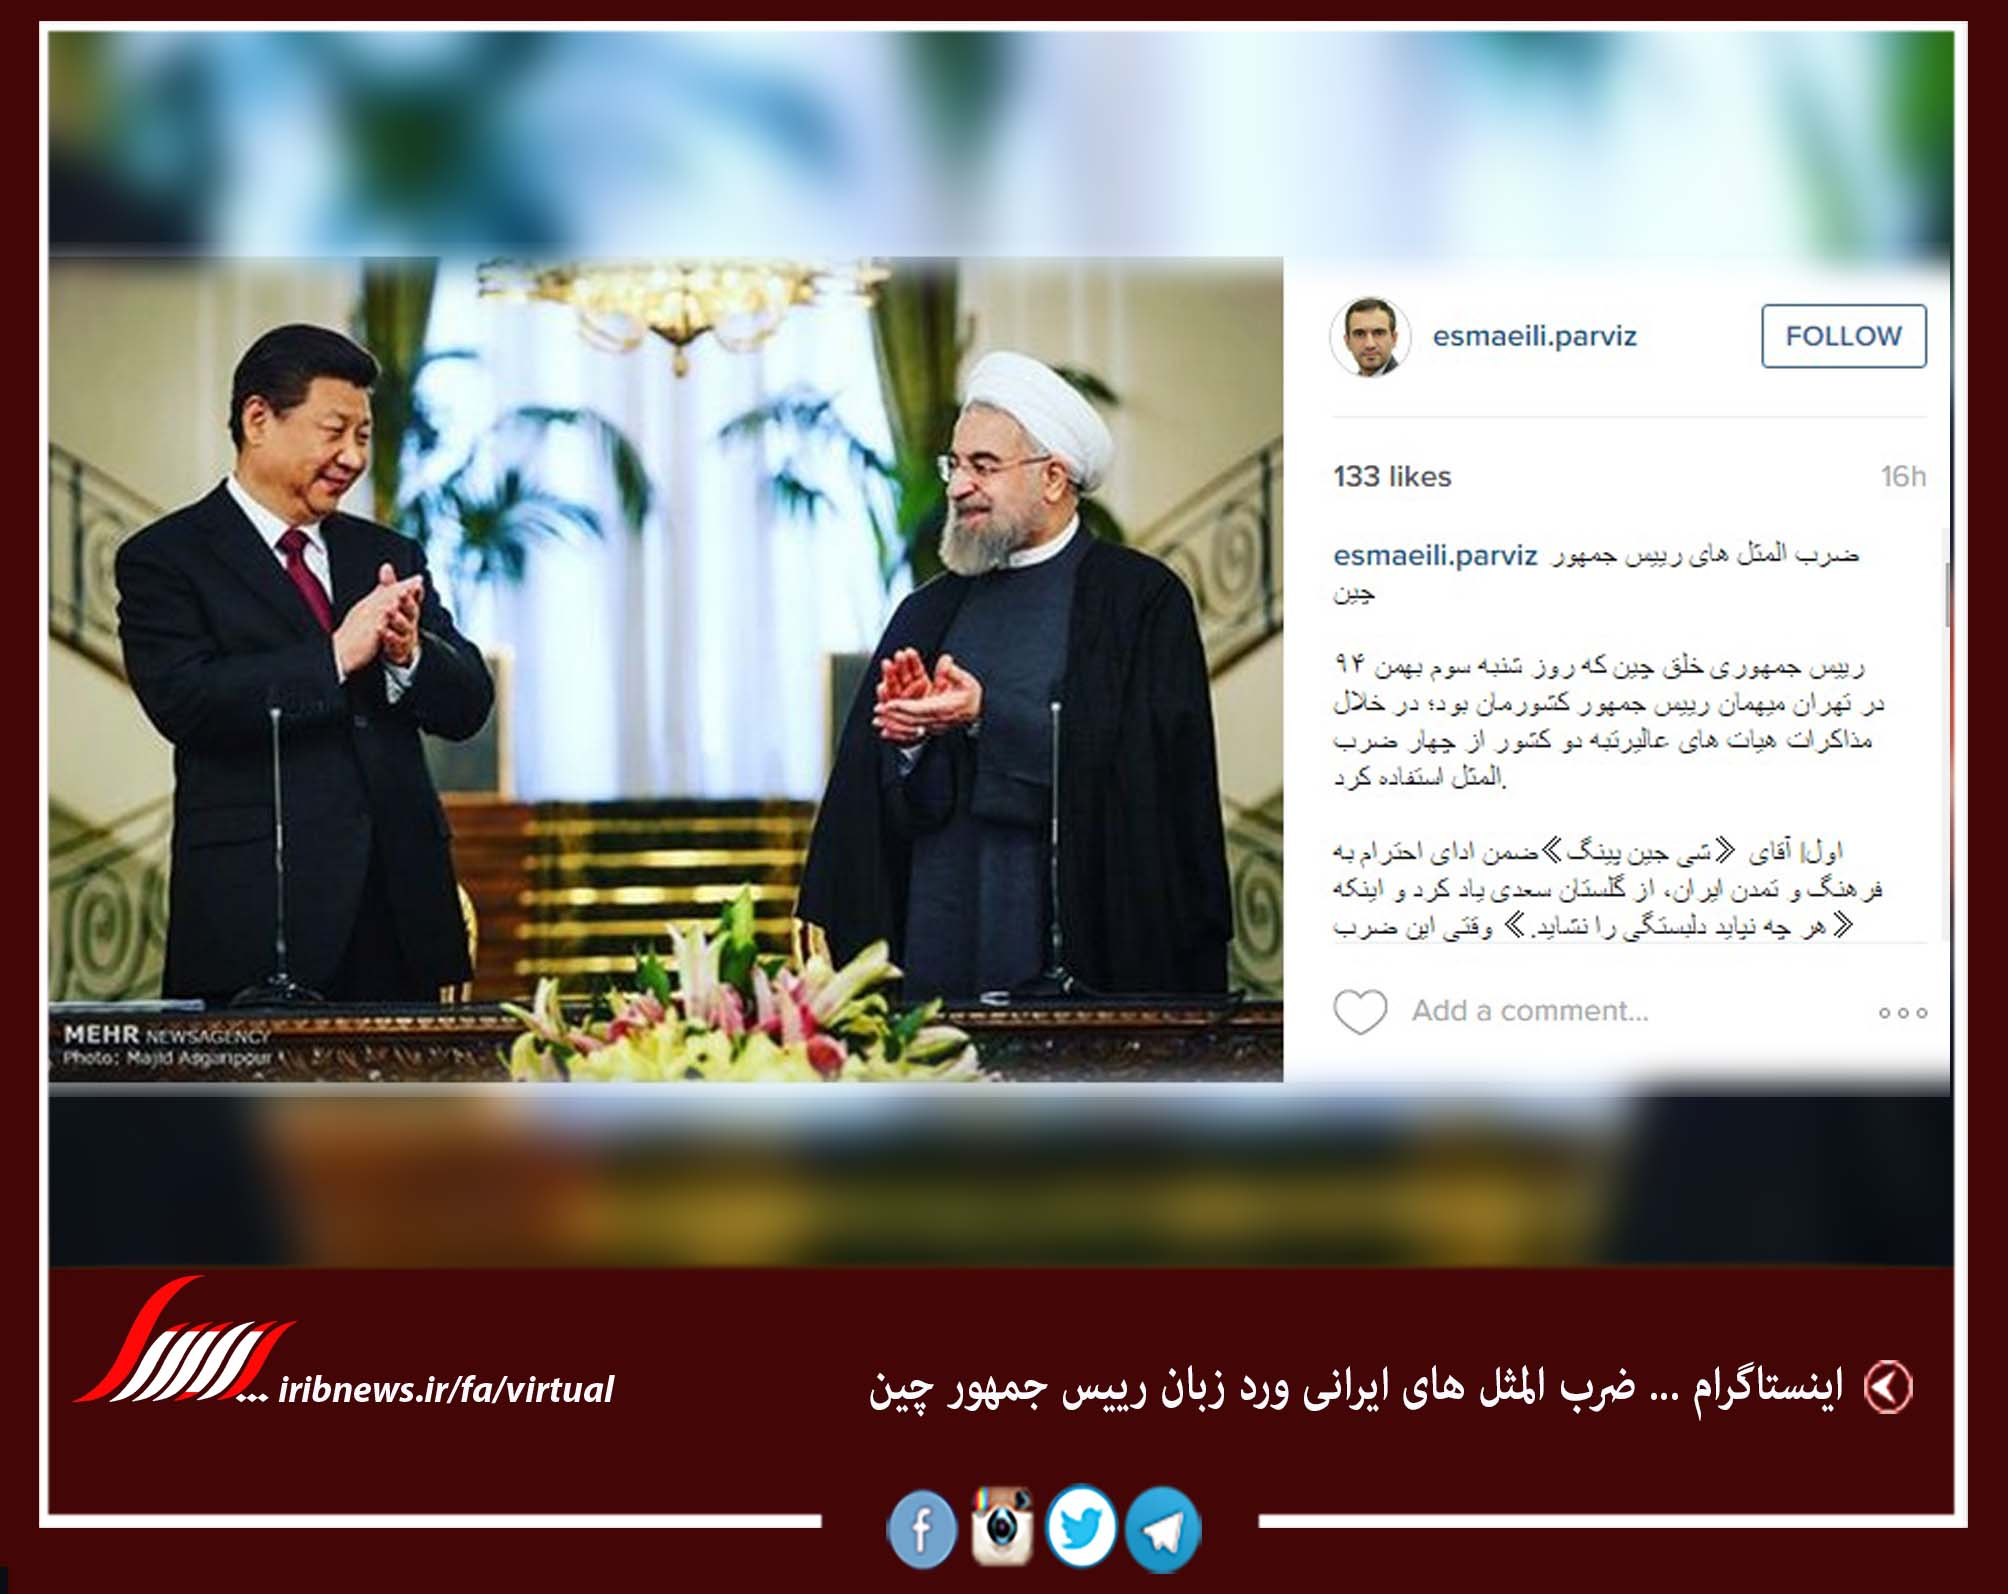 کانال+تلگرام+ضرب+المثل+ایرانی